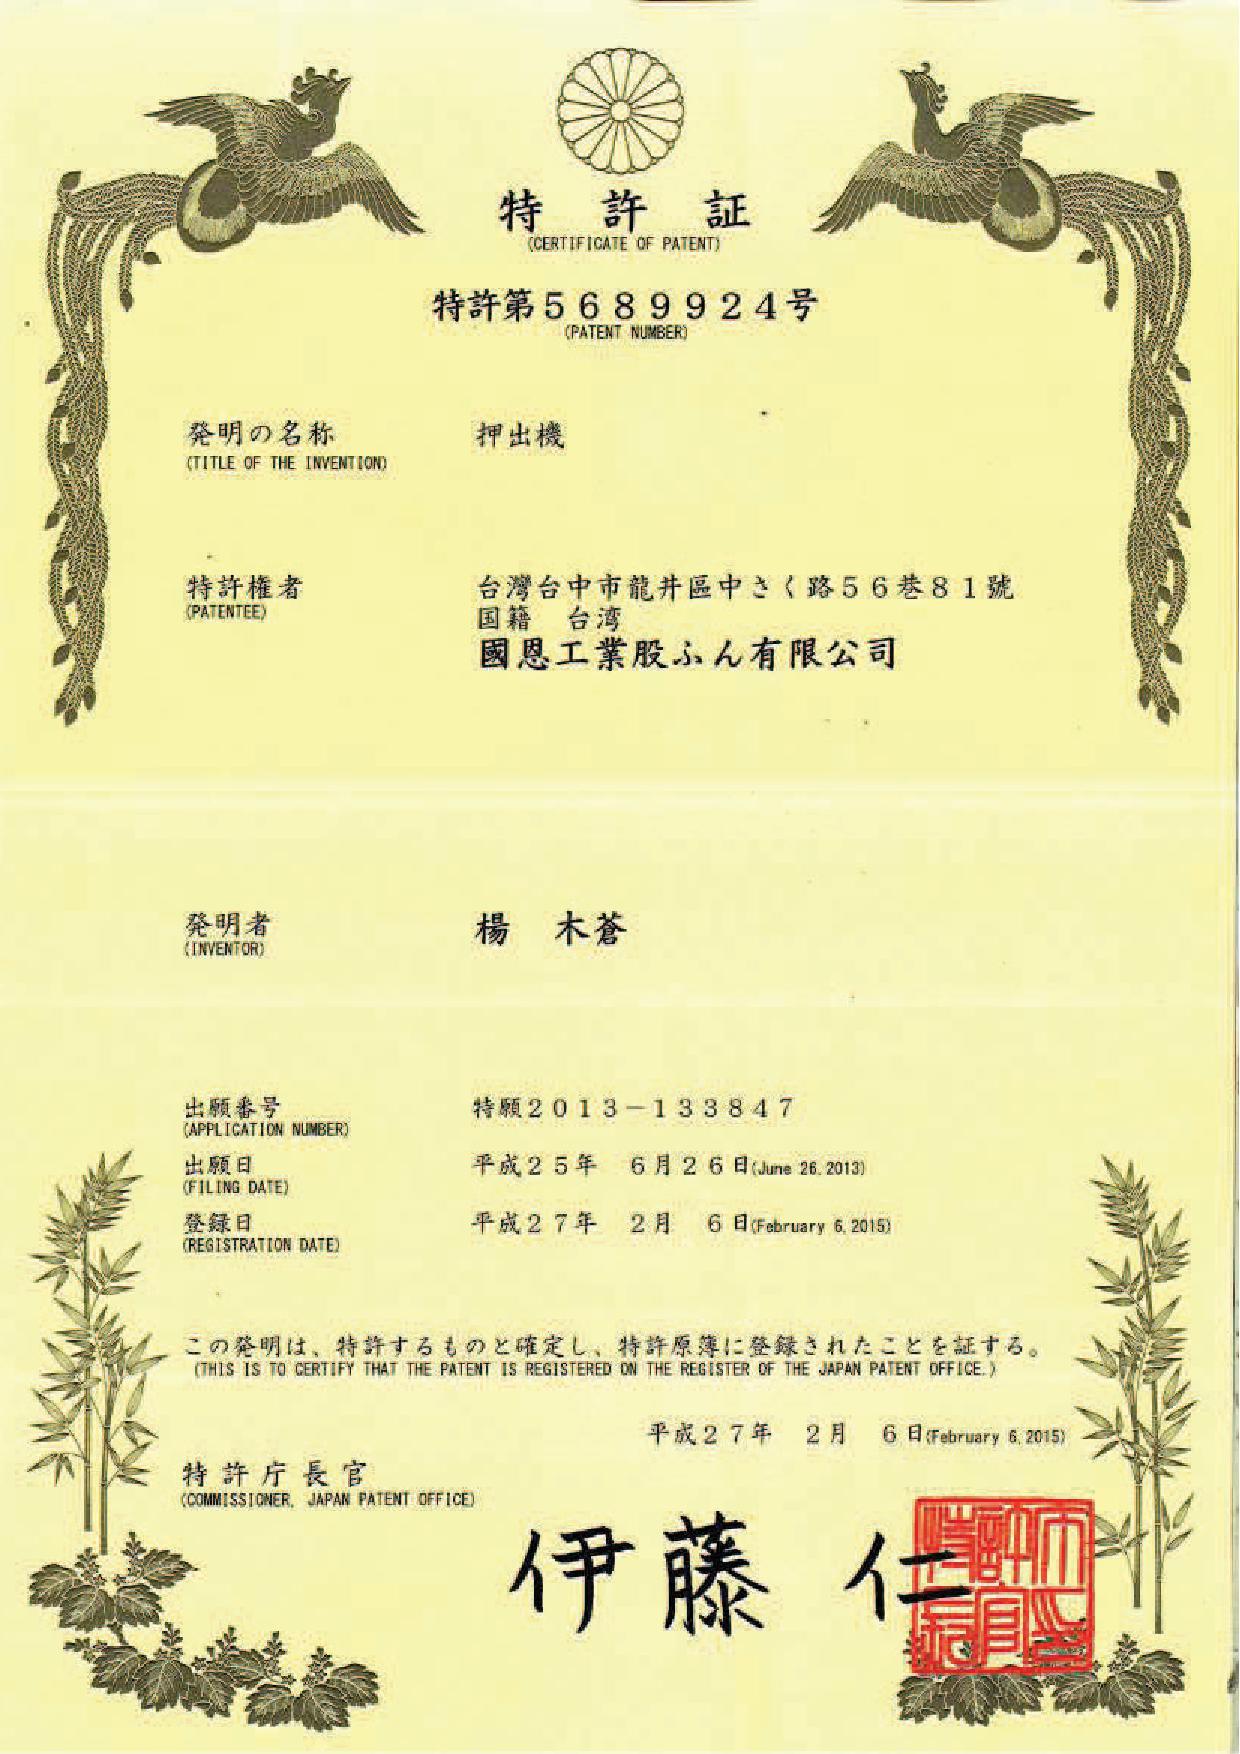 proimages/發明5689924押出機_(日本).jpg